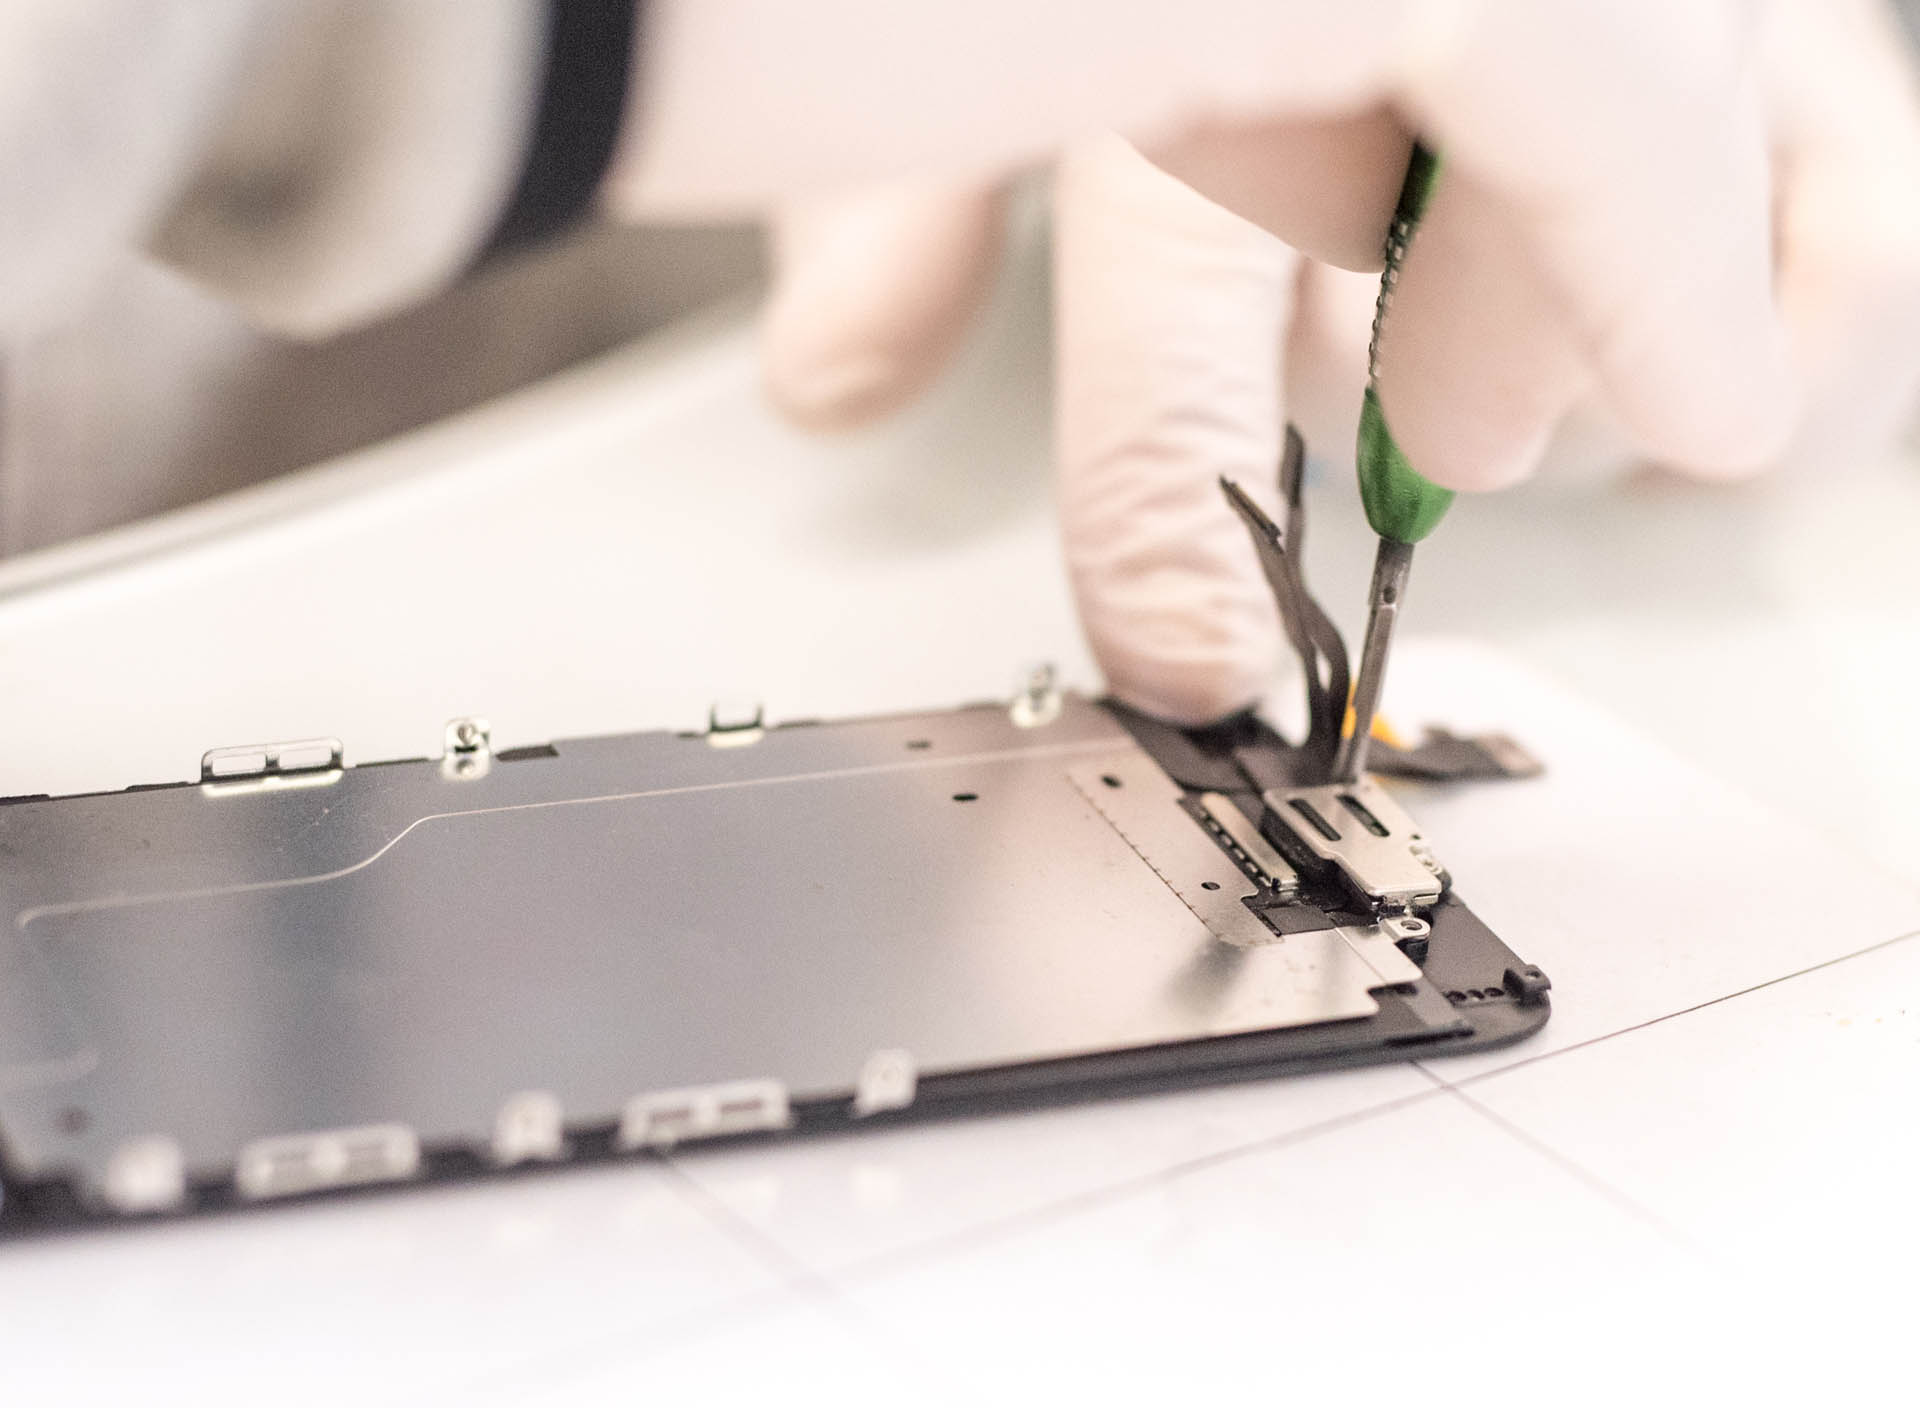 RPM Wireless smartphone repair.jpeg